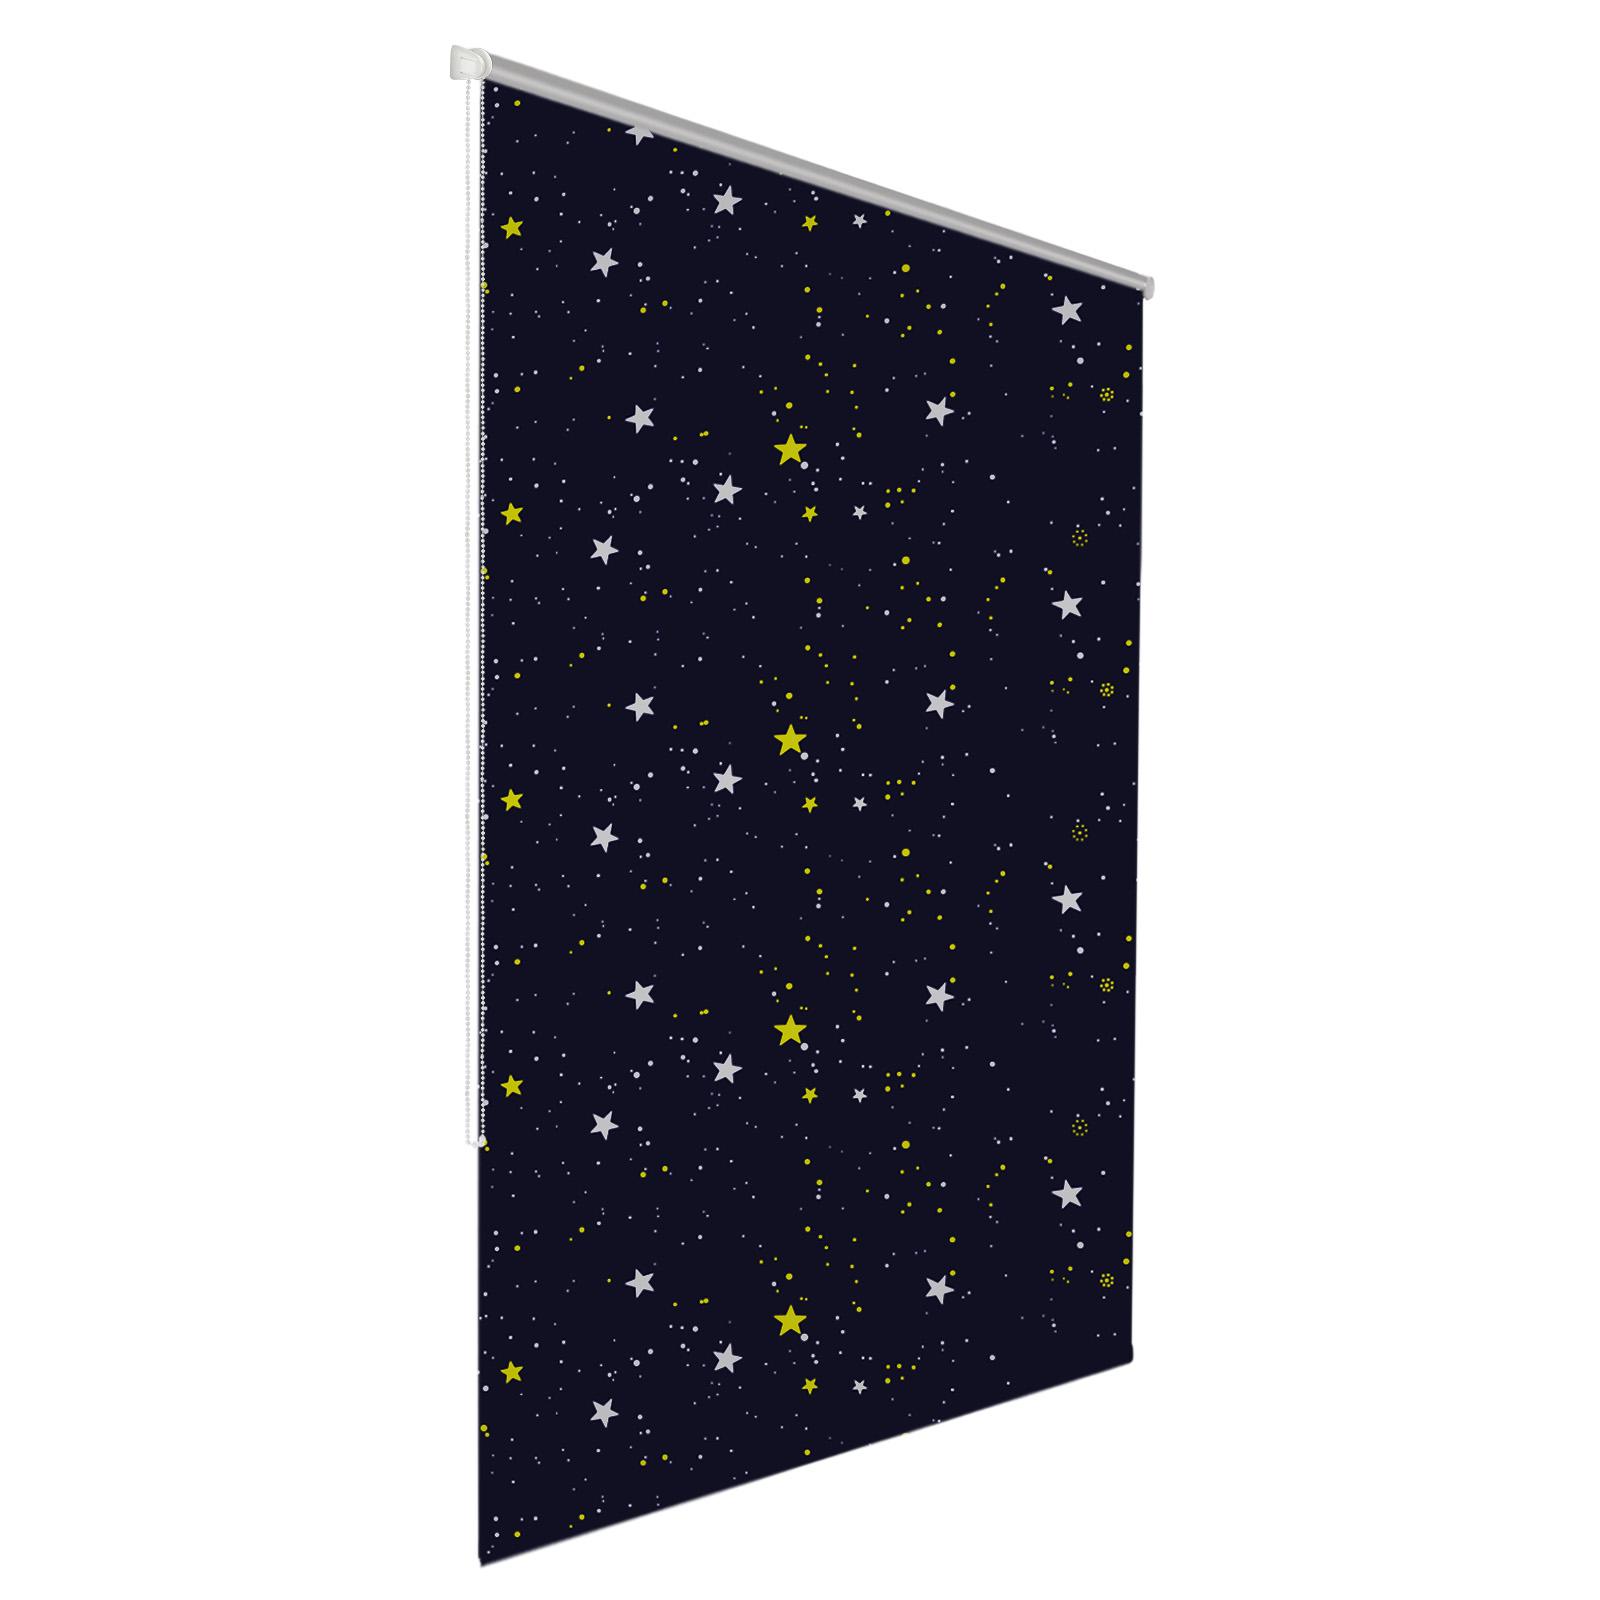 verdunkelungsrollo fenster in verschiedenen farben breiten. Black Bedroom Furniture Sets. Home Design Ideas